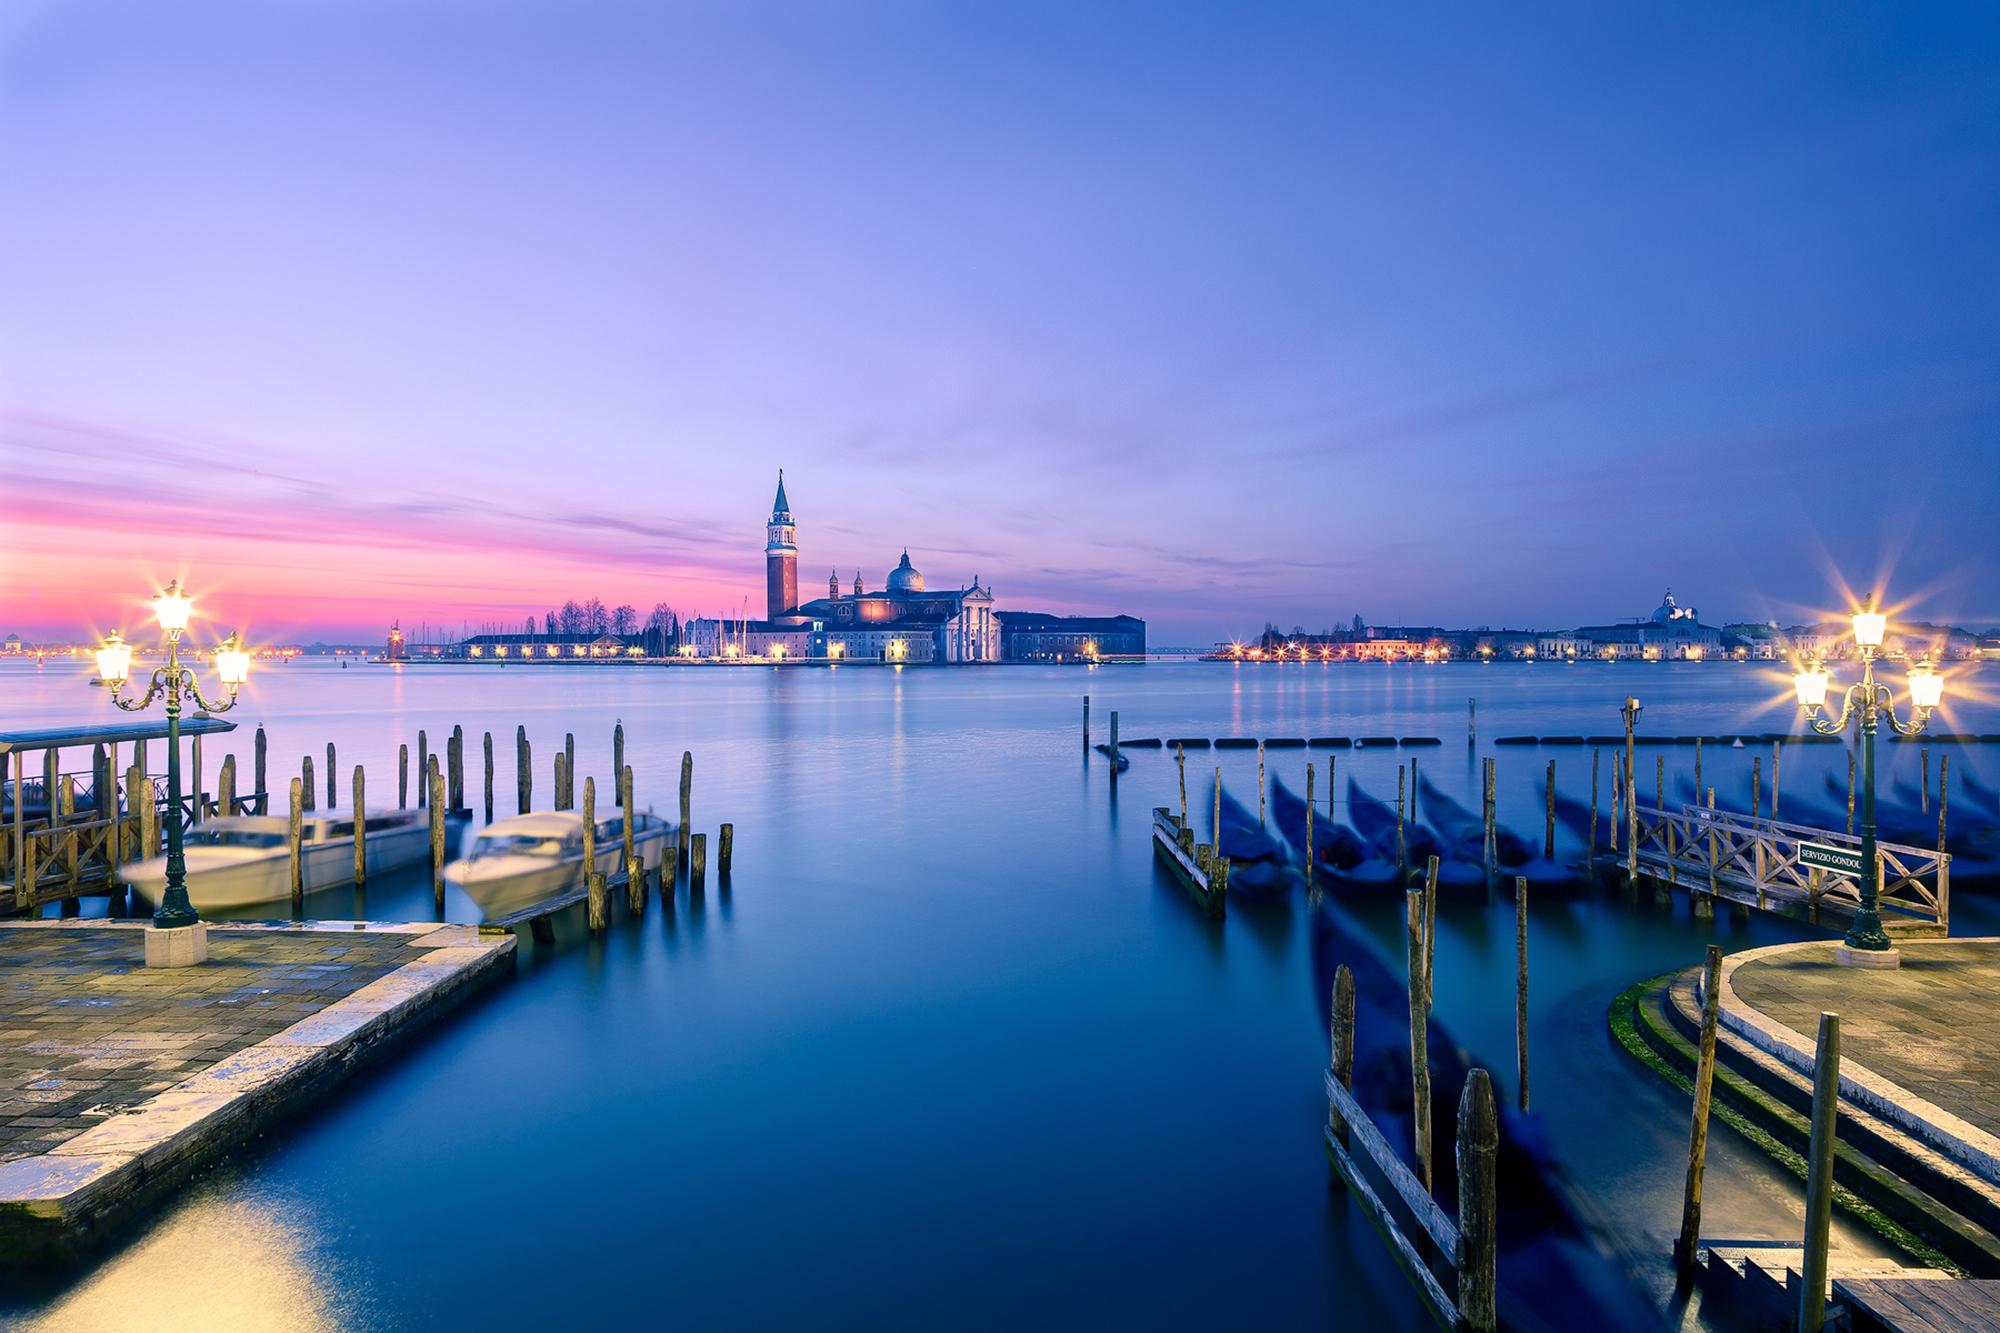 Sunset Over Grand Canal, Venice, Italy  № 1471215 загрузить